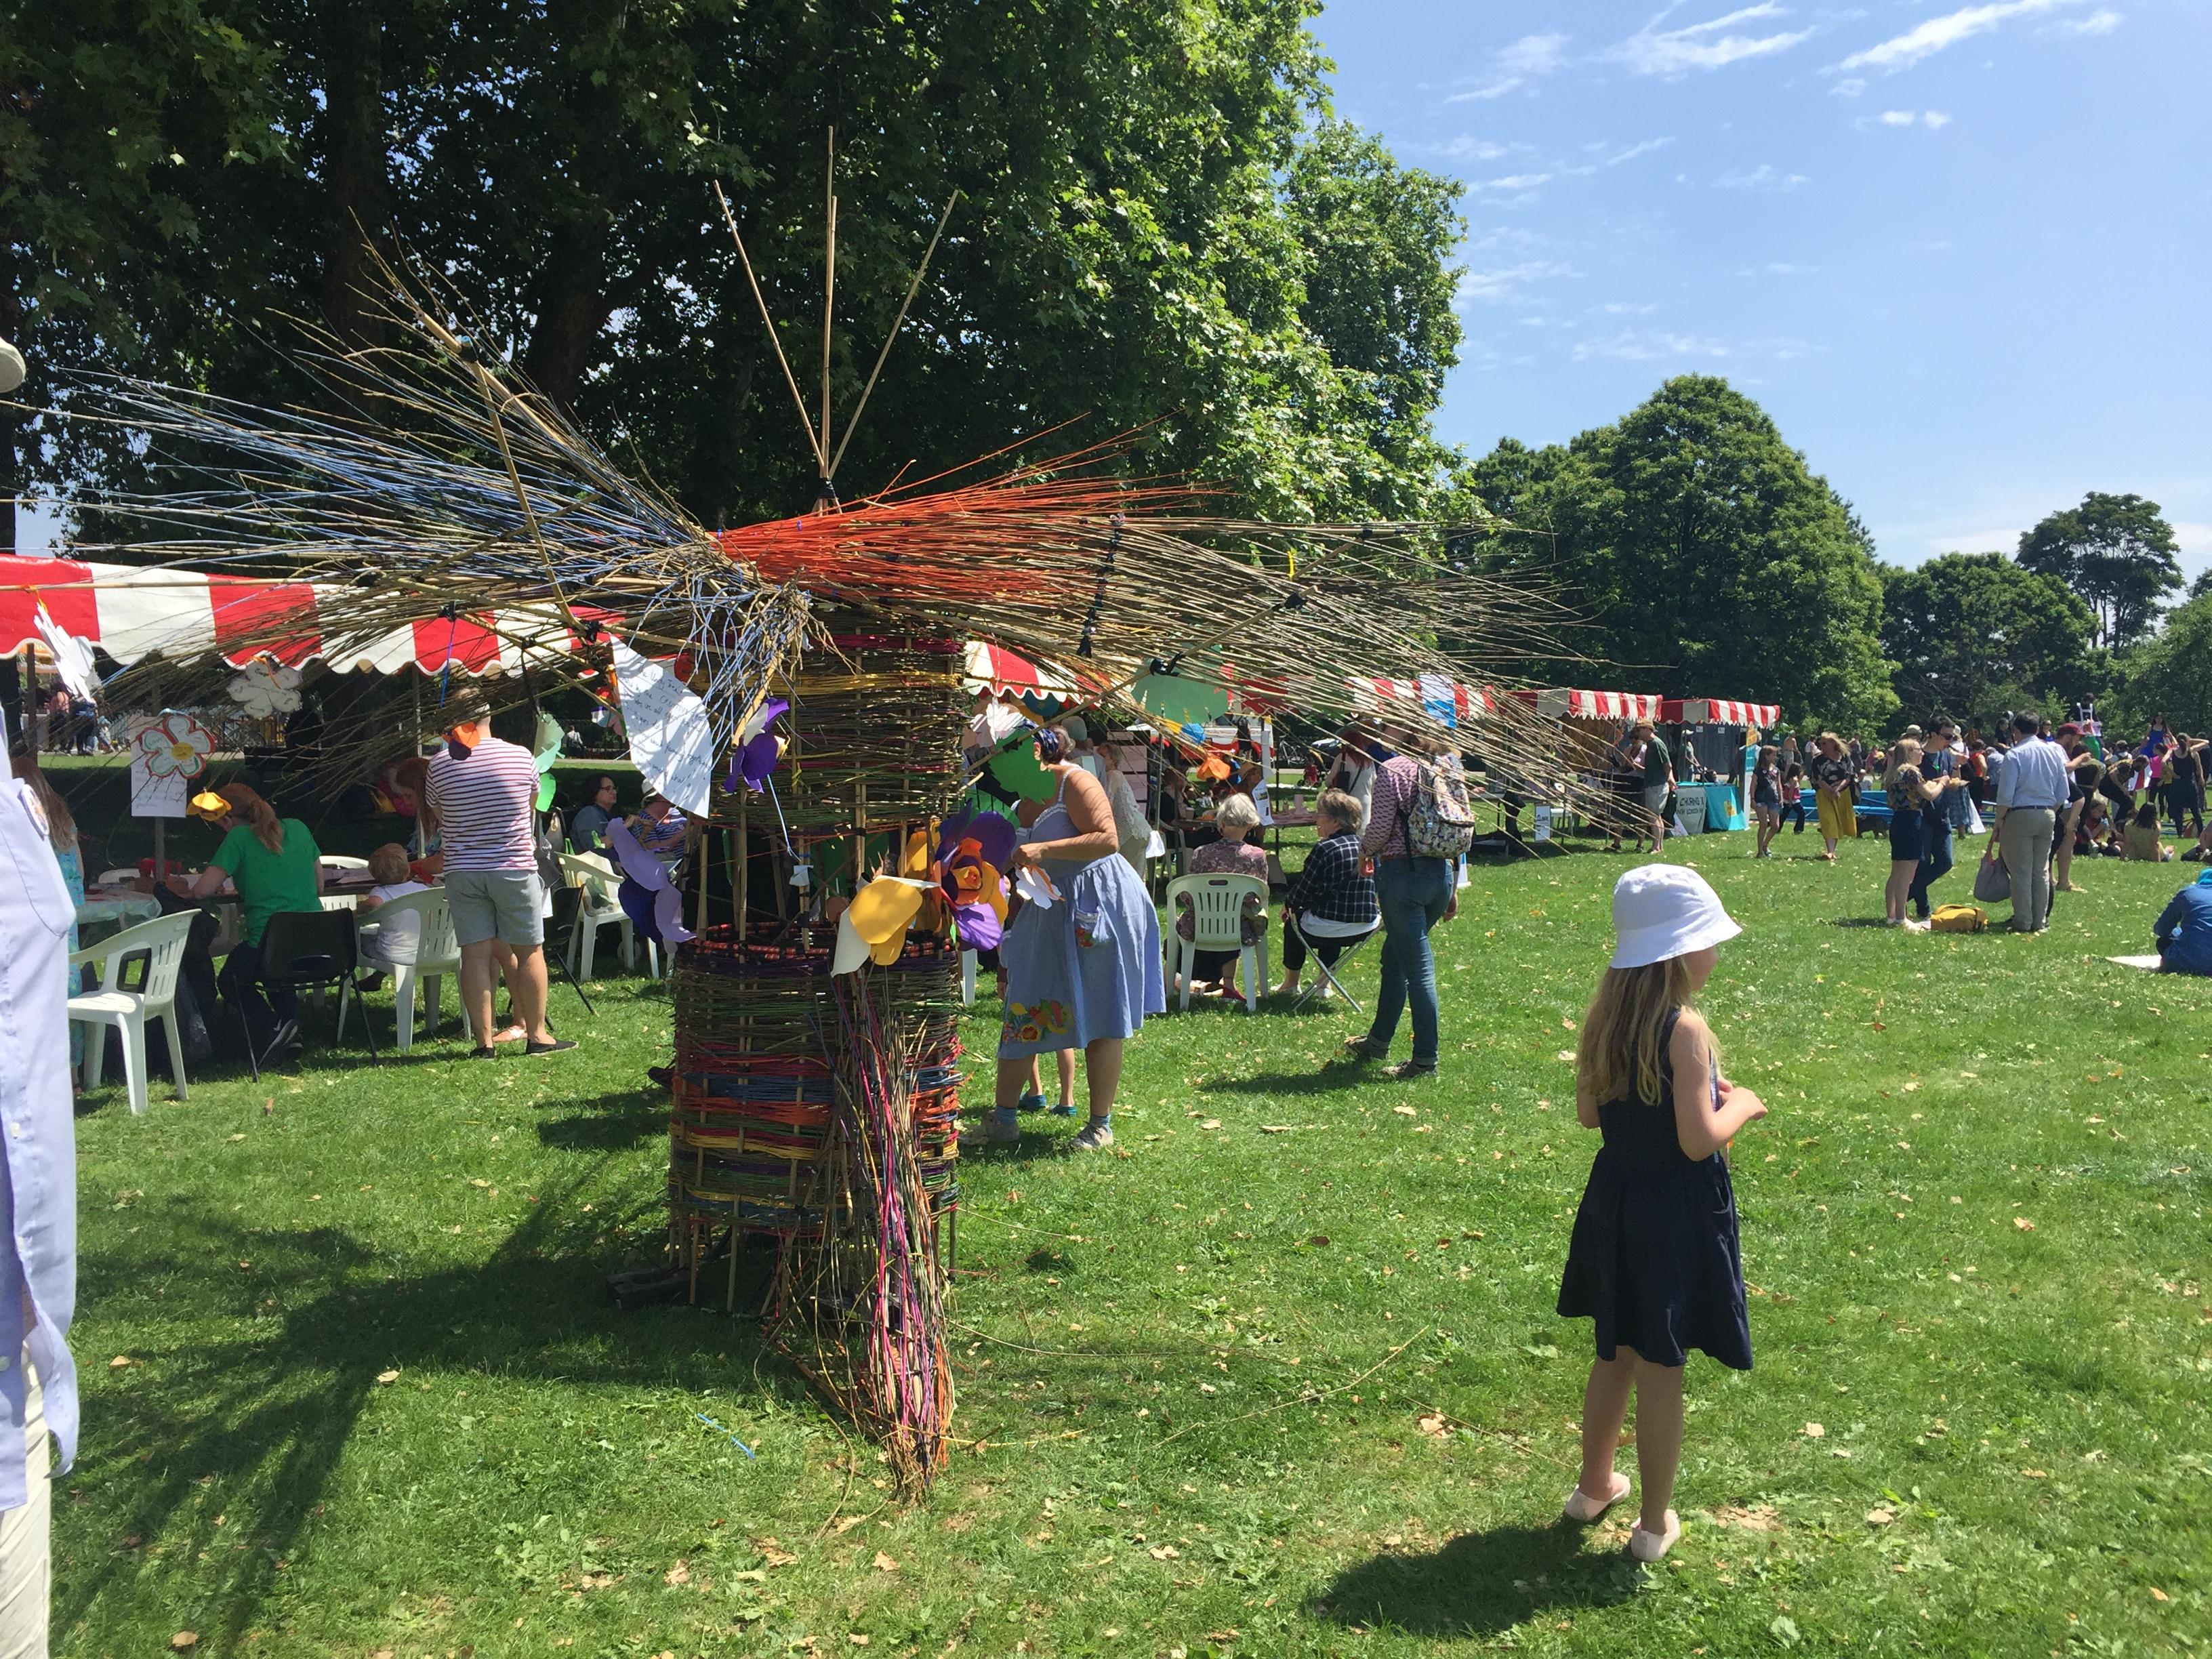 Unity Tree lights up Unity Day | Blog